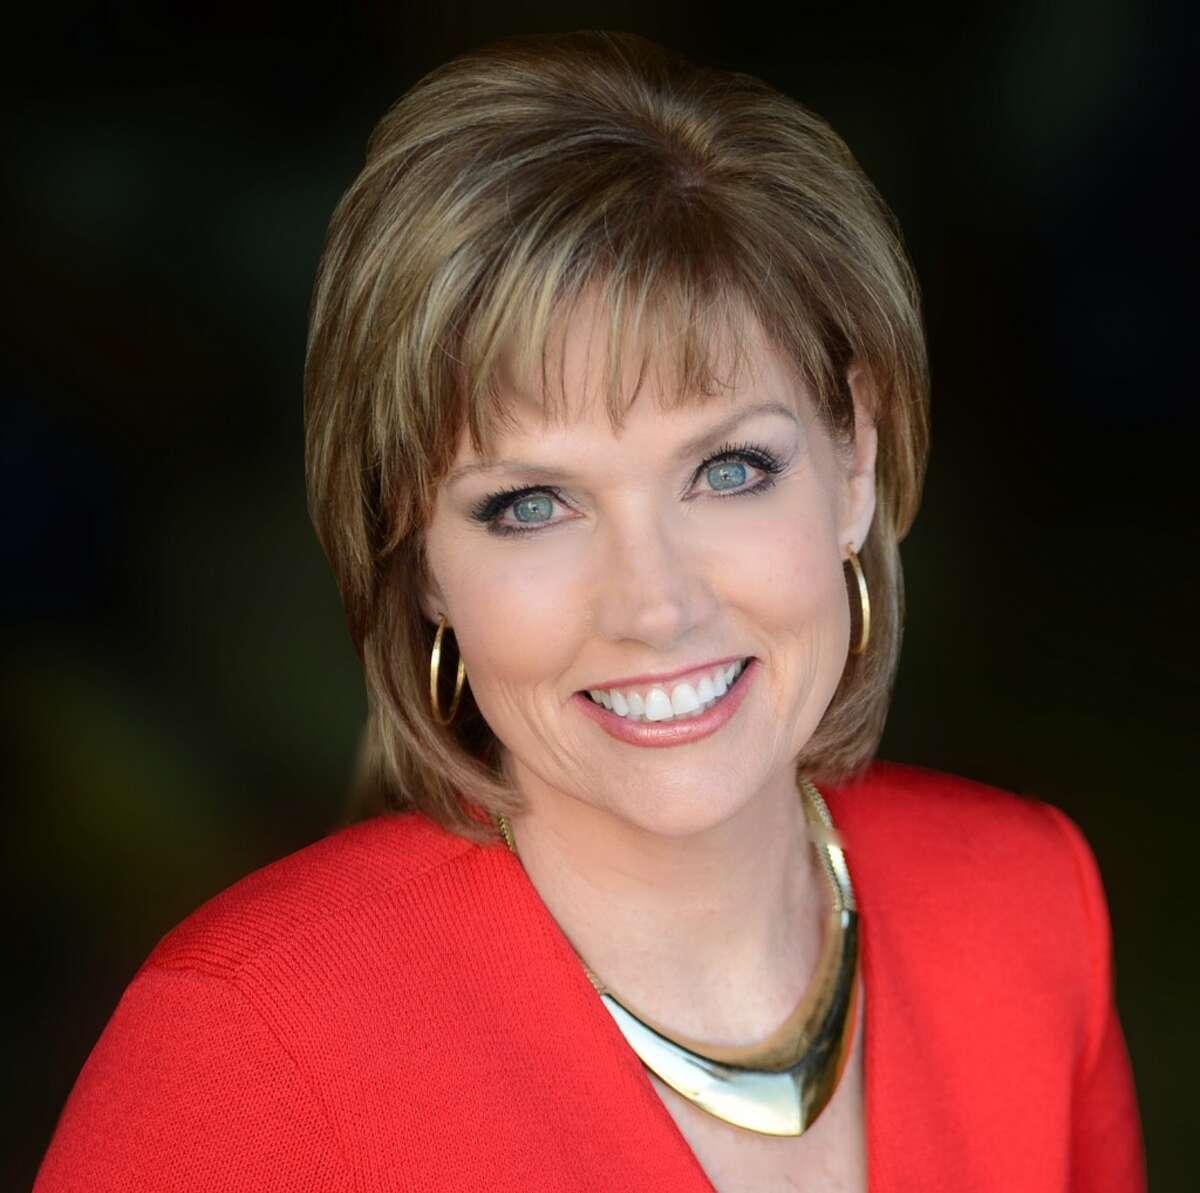 Deborah Knapp, S.A. TV news royalty